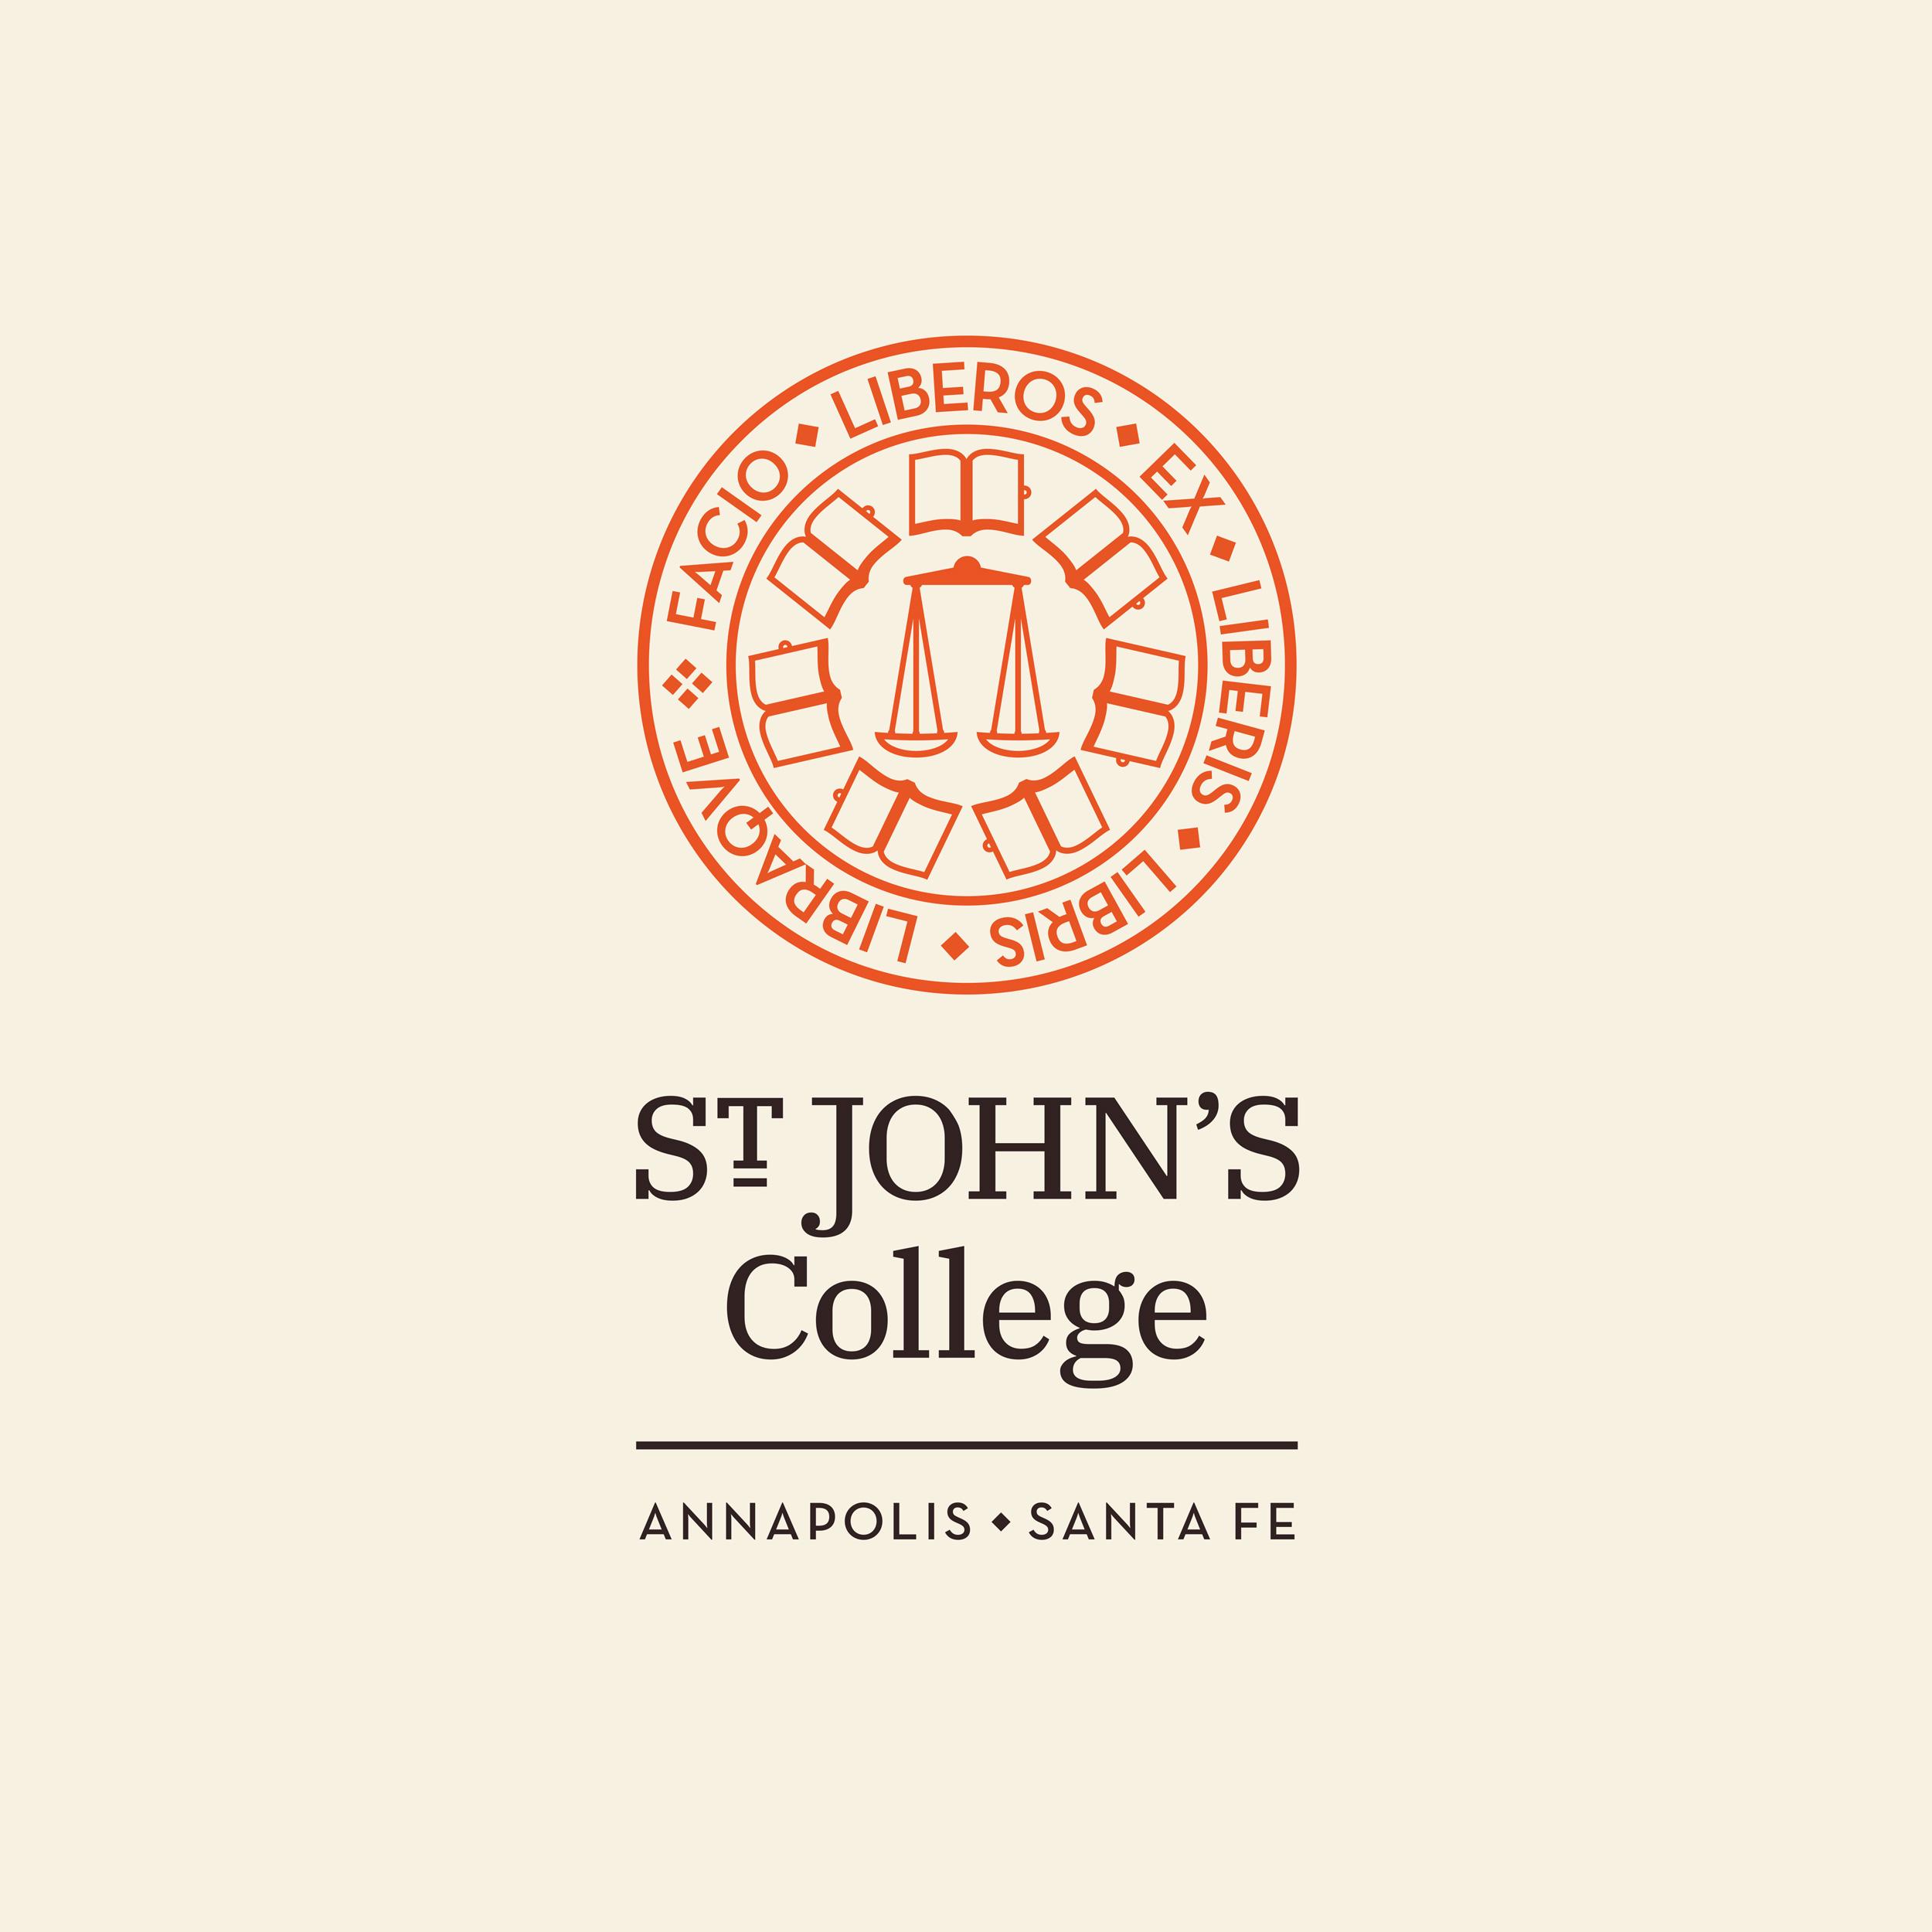 SJC_new_logo.jpg